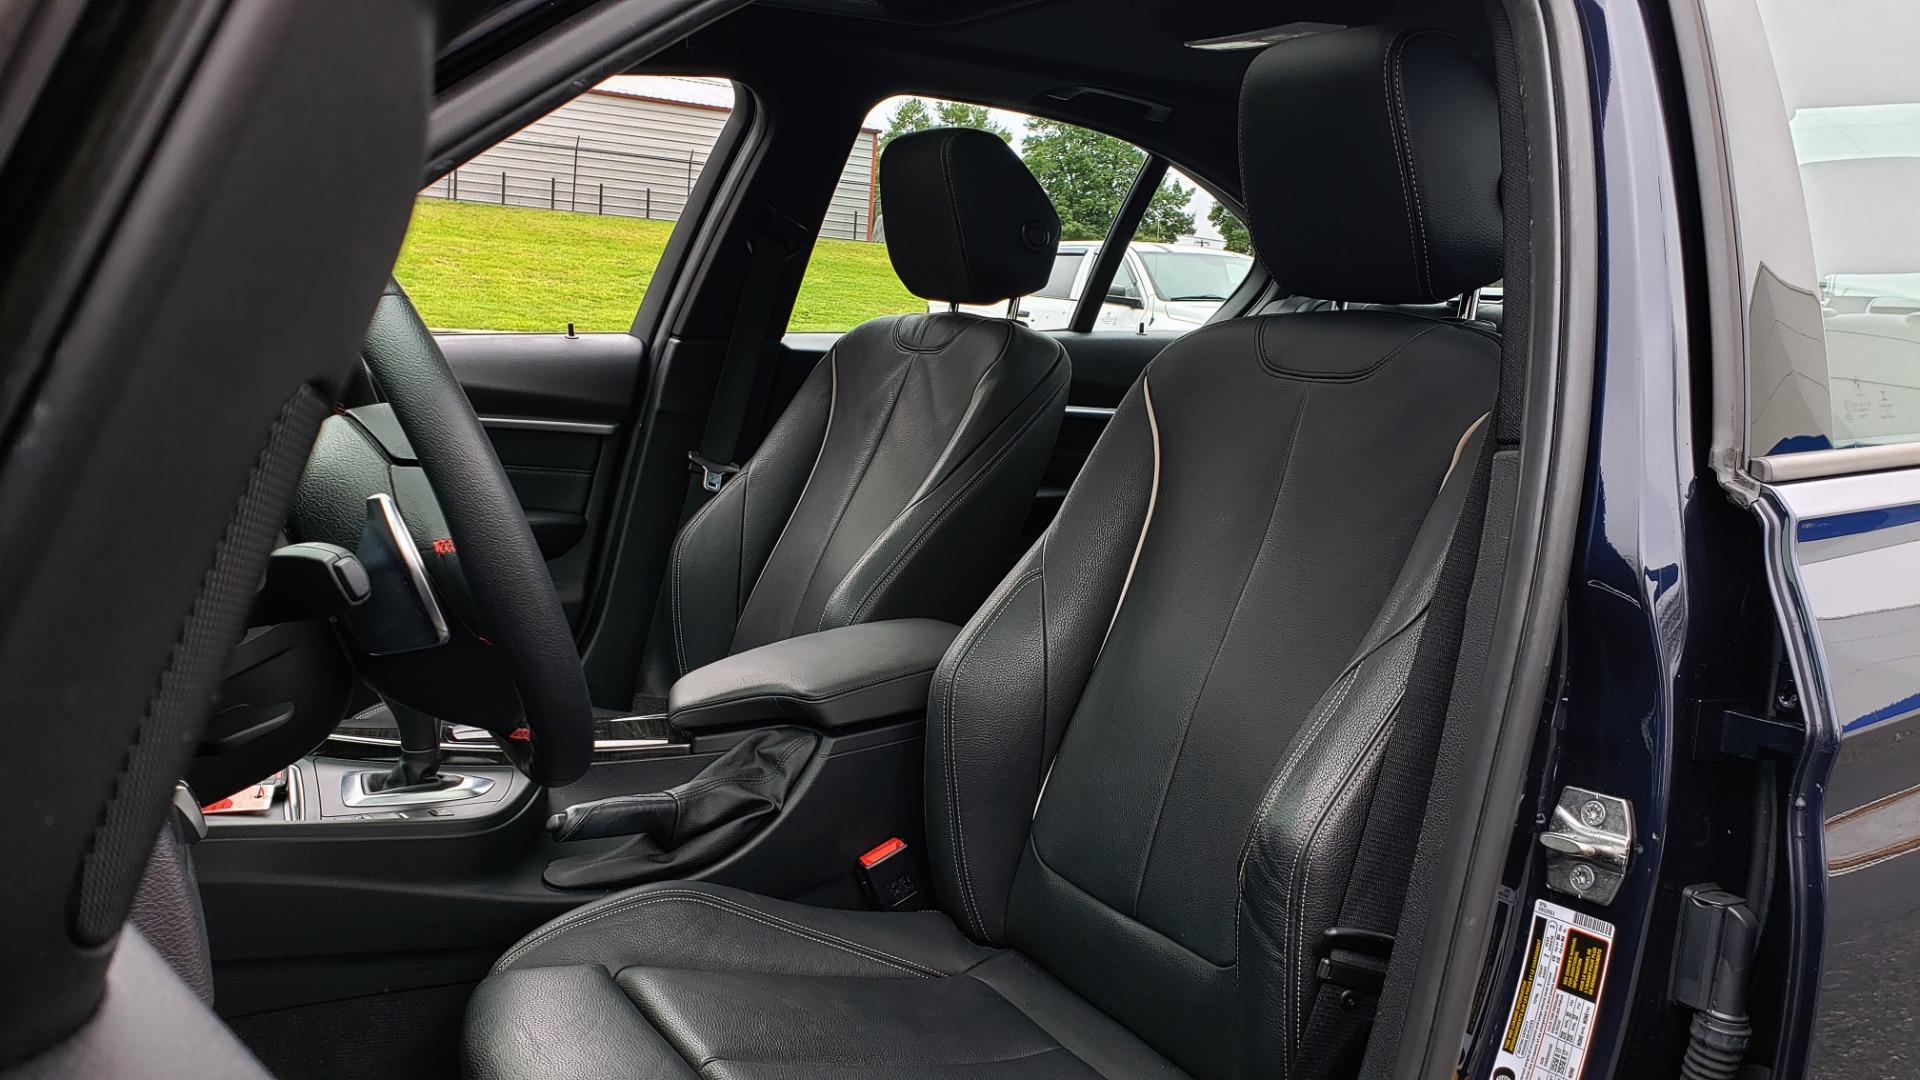 Used 2016 BMW 3 SERIES 328I PREMIUM PKG / DRVR ASST / SUNROOF / PARK ASST for sale Sold at Formula Imports in Charlotte NC 28227 33